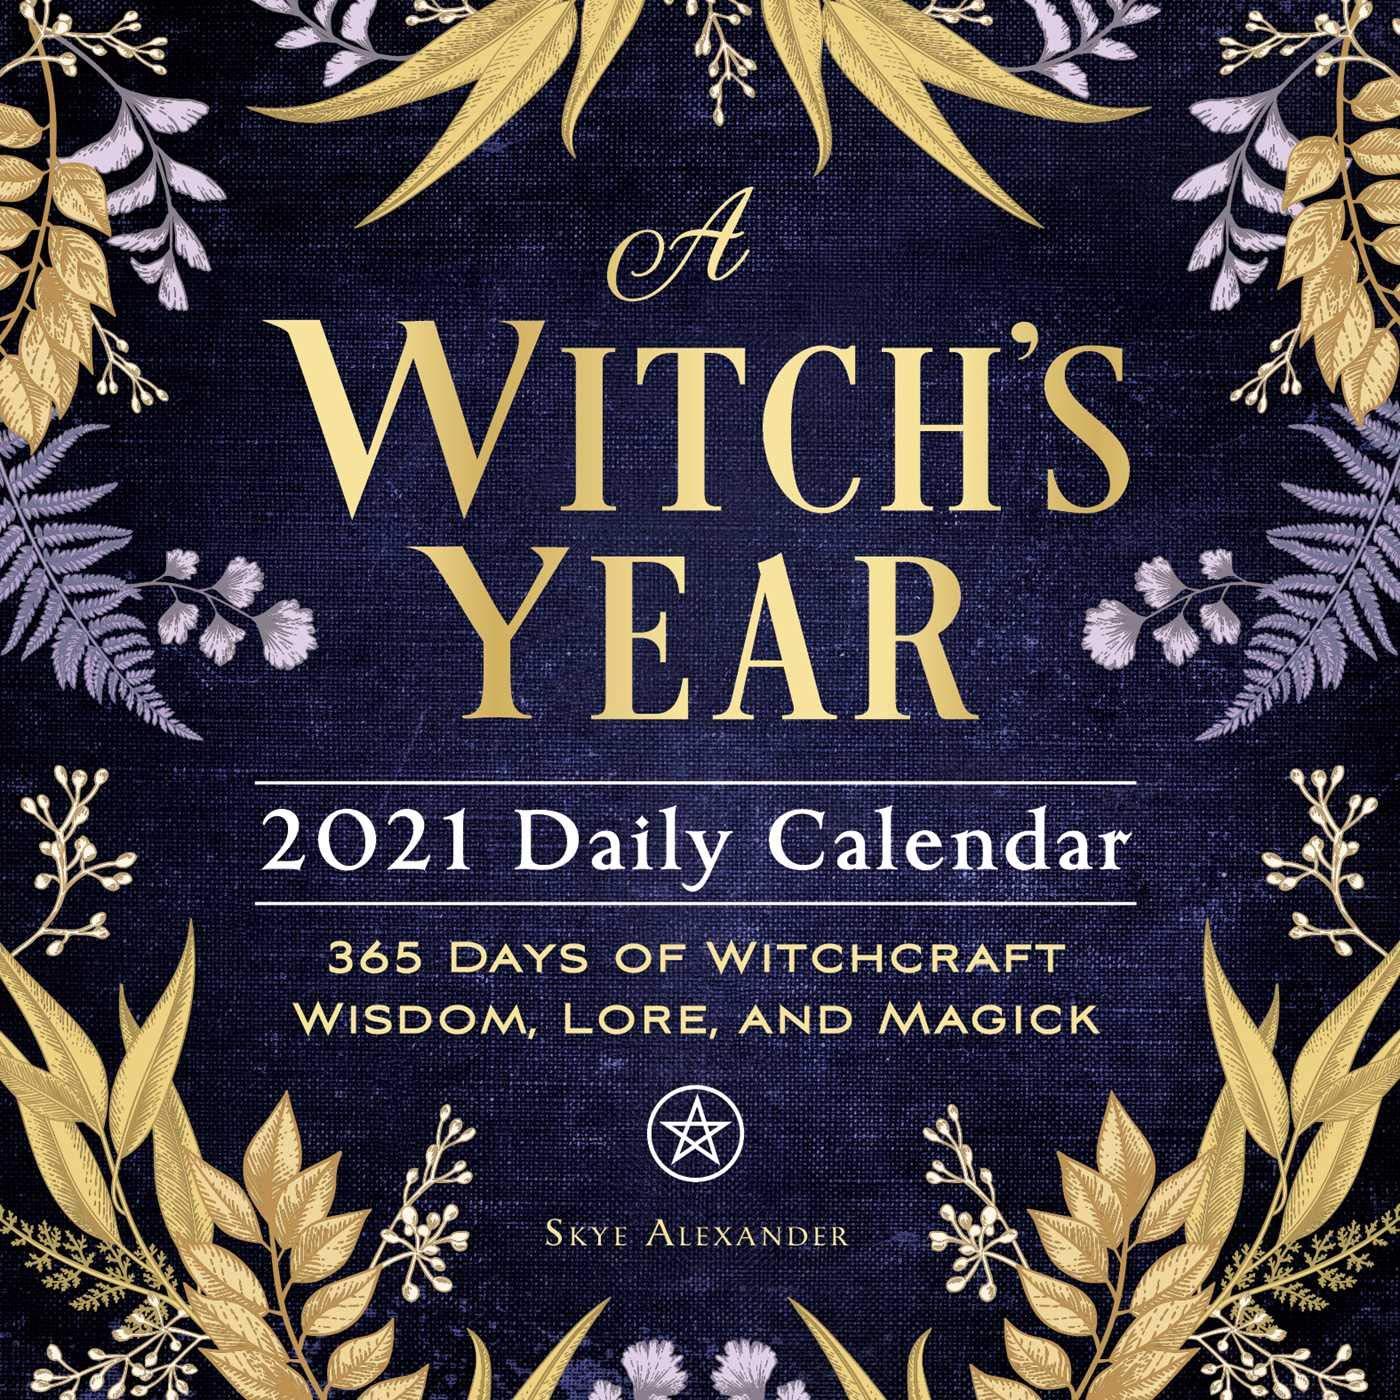 A Witch's Year 2021 Daily Calendar: 365 Days of Witchcraft Wisdom